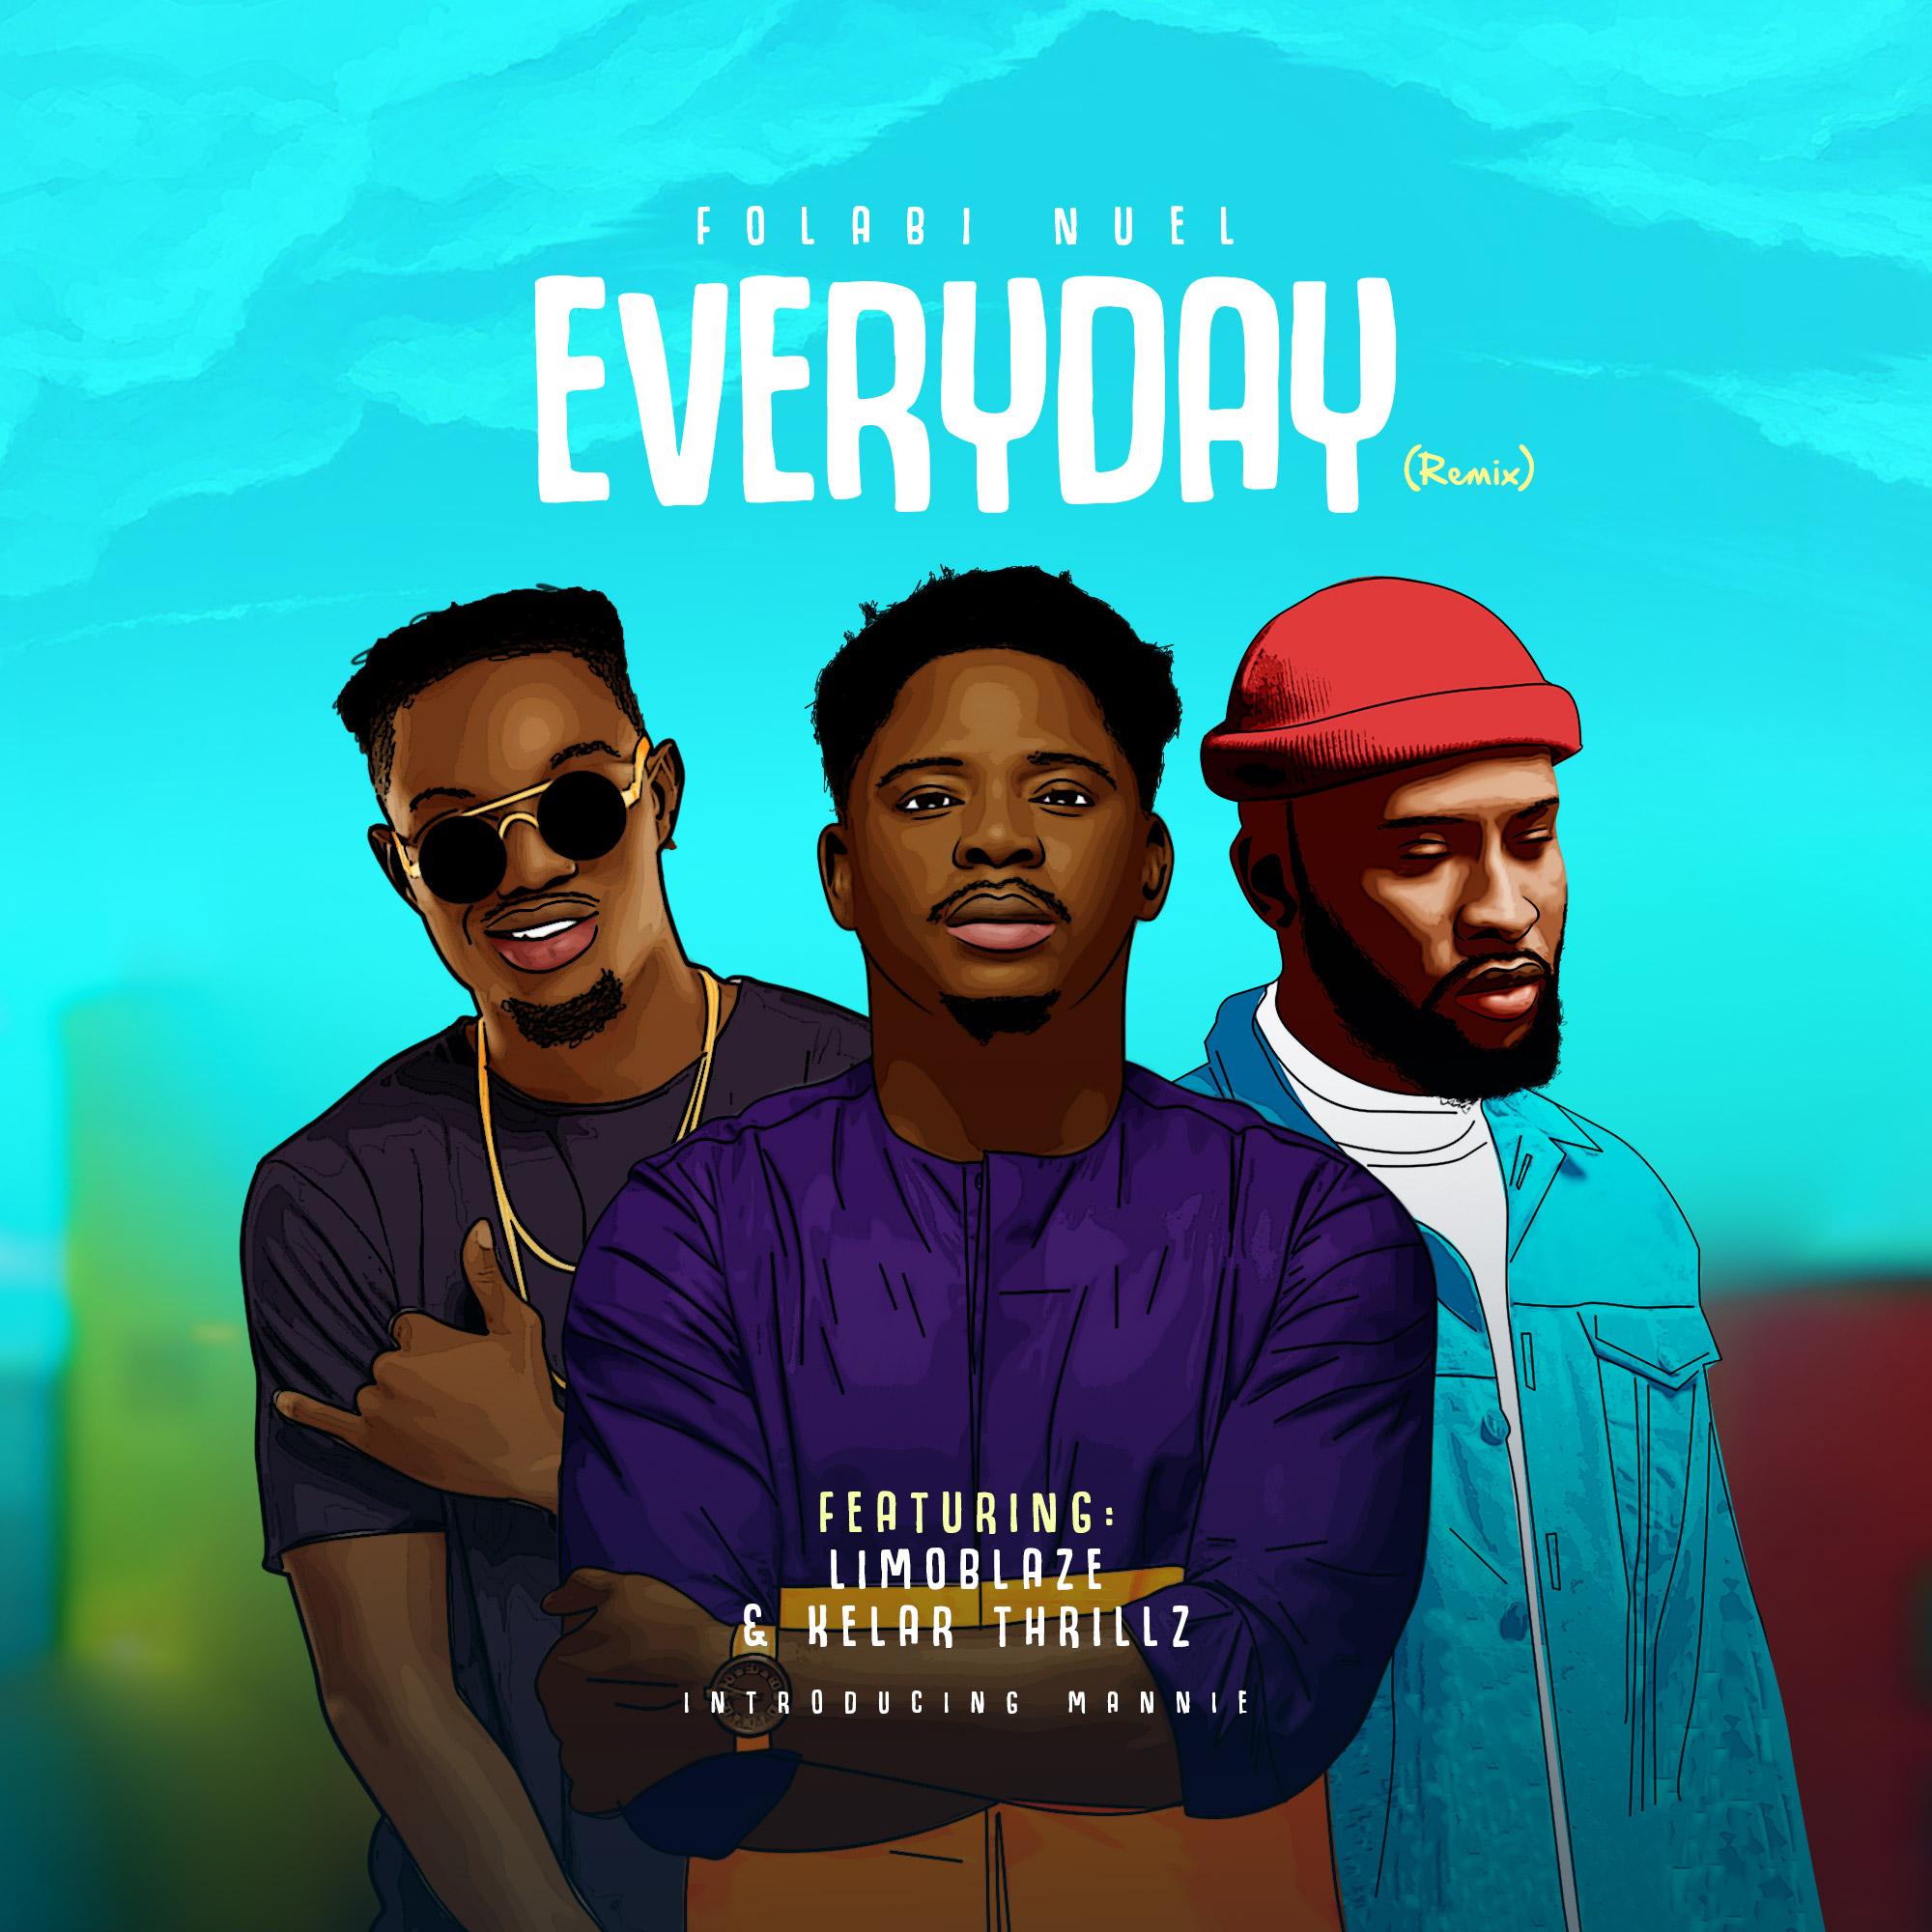 DOWNLOAD MP3: Folabi Nuel – Everyday (Remix) ft Limoblaze, Kelar Thrillz & Mannie Music